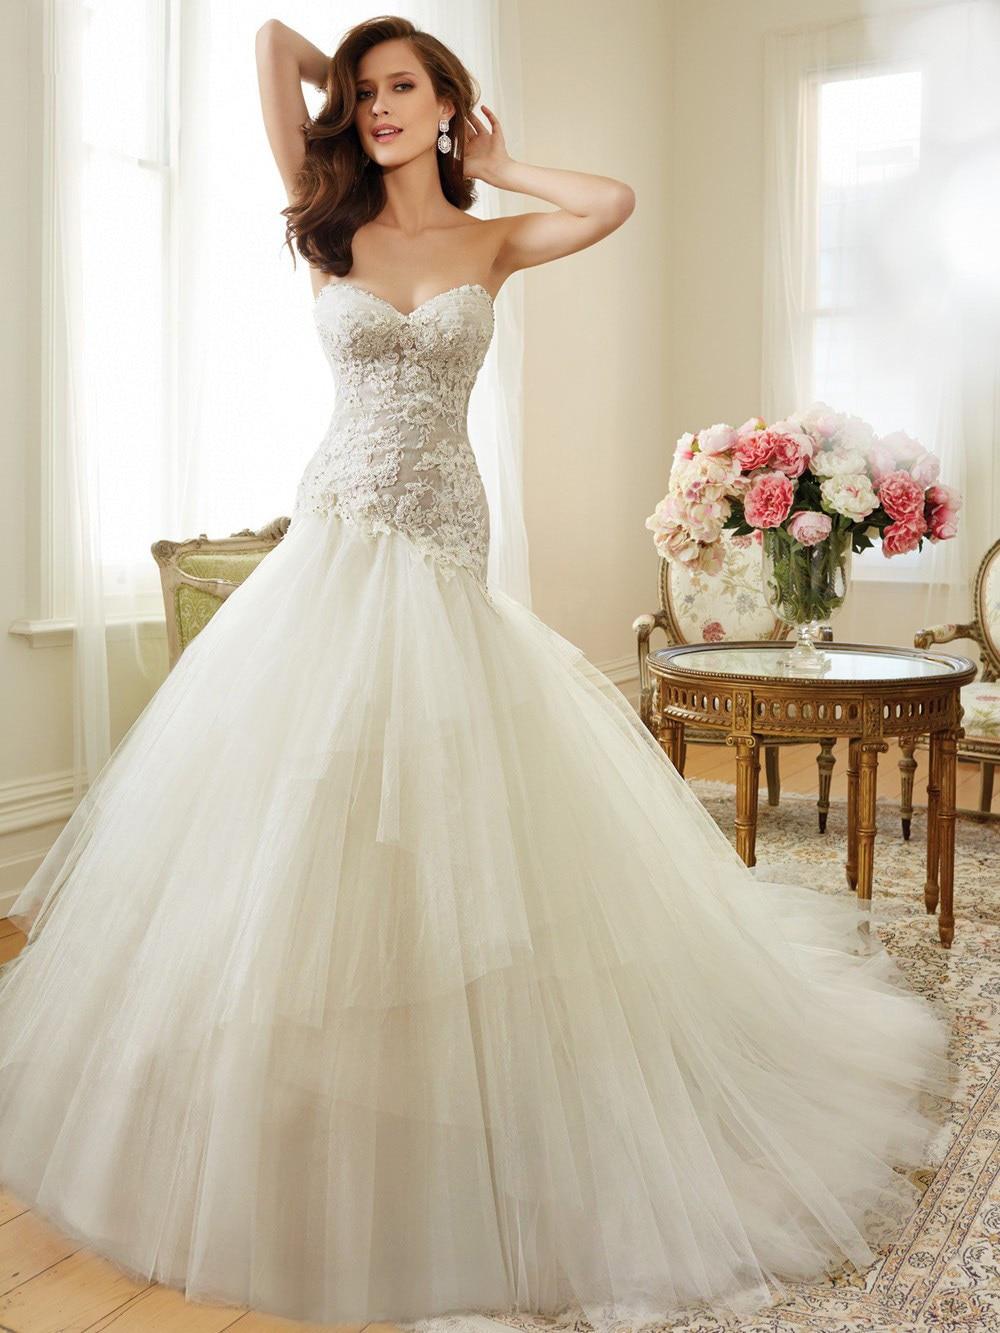 2015Mermaid Weddubg Dress With Detachable Stap Bottom Tulle Appliqued Mermaid Style Wedding Gown Sweetheart Neckline JM69 In Dresses From Weddings